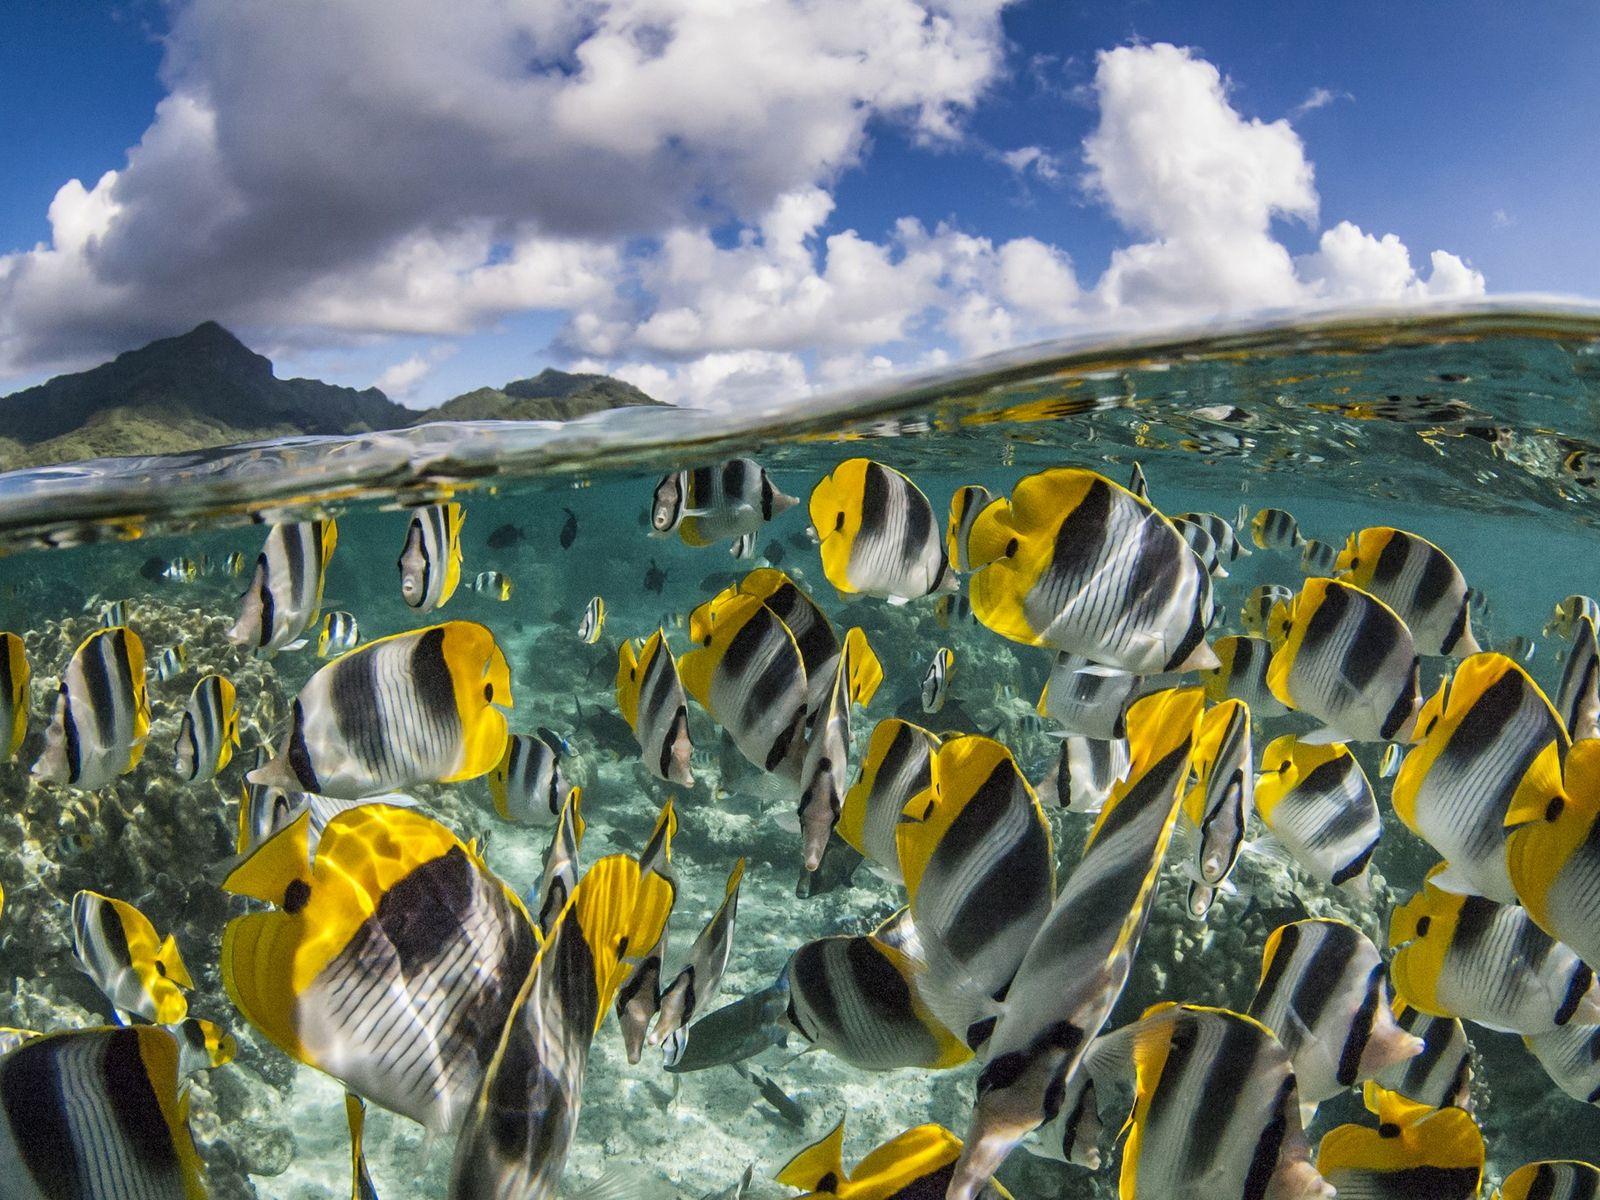 POLINÉSIA FRANCESA  Canais submersos interligam o mar aberto aos recifes circulares das Ilhas de Tuamotu, permitindo ...